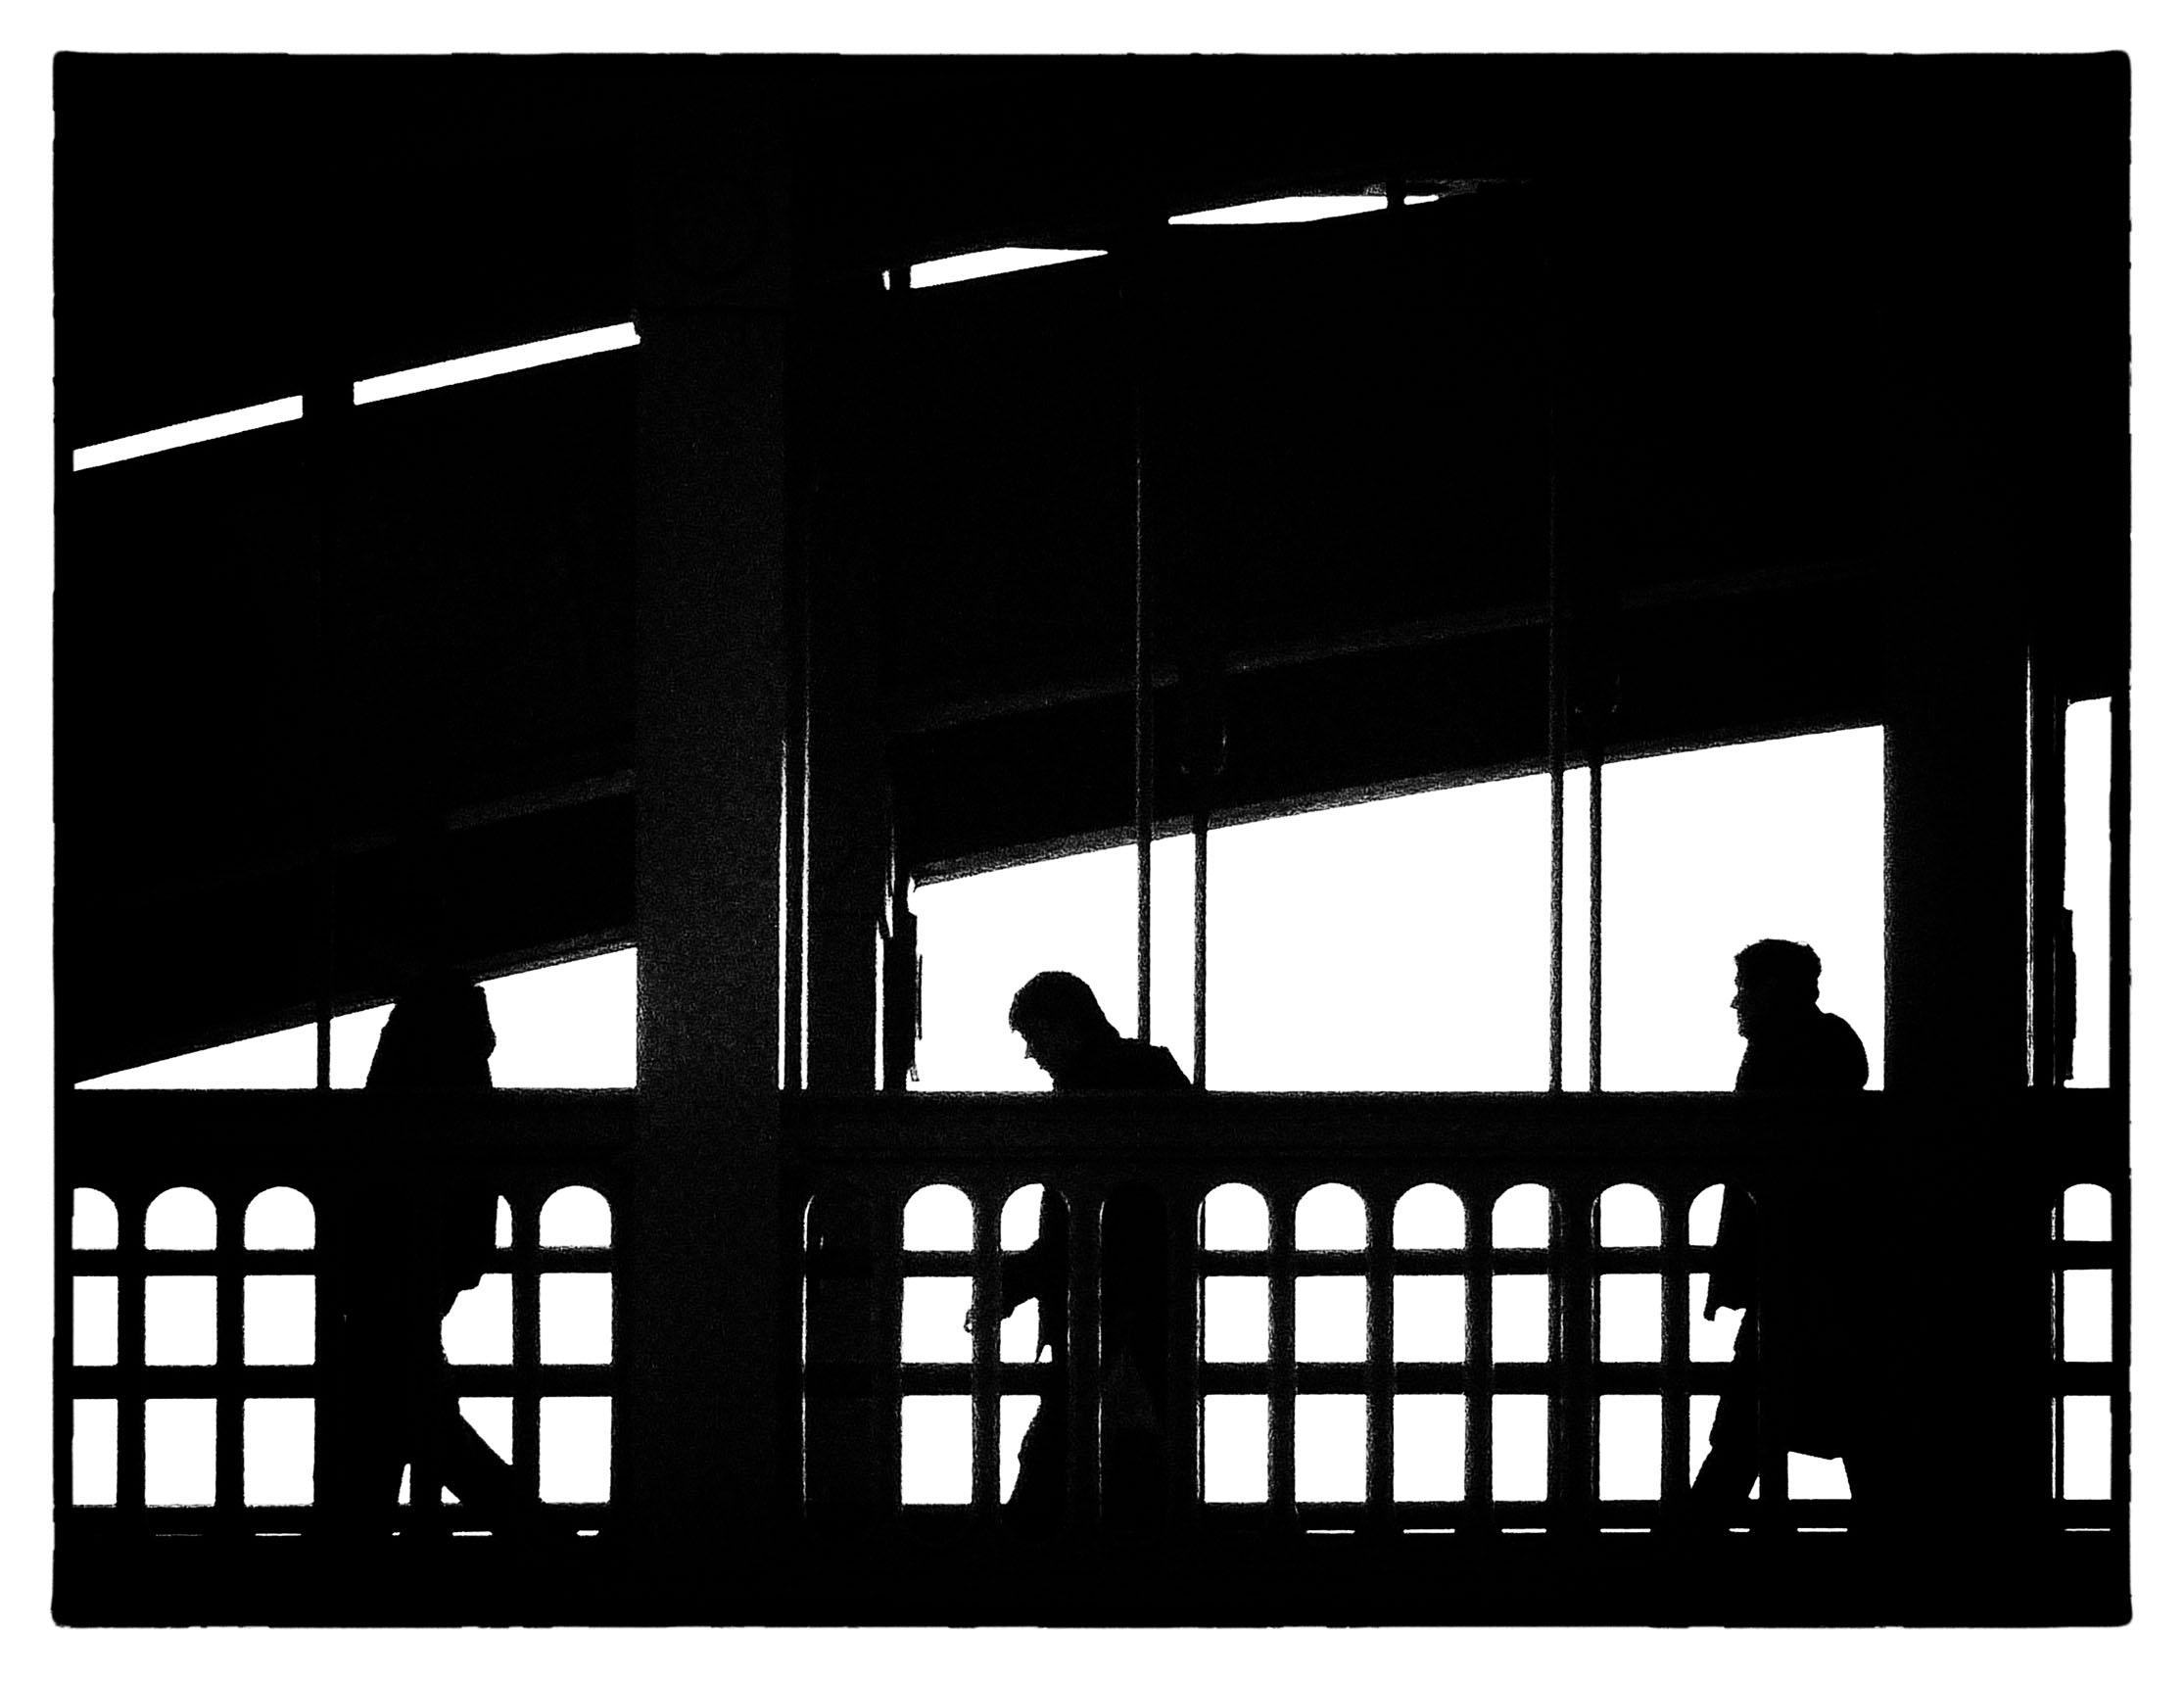 People on a bridge in silhouette